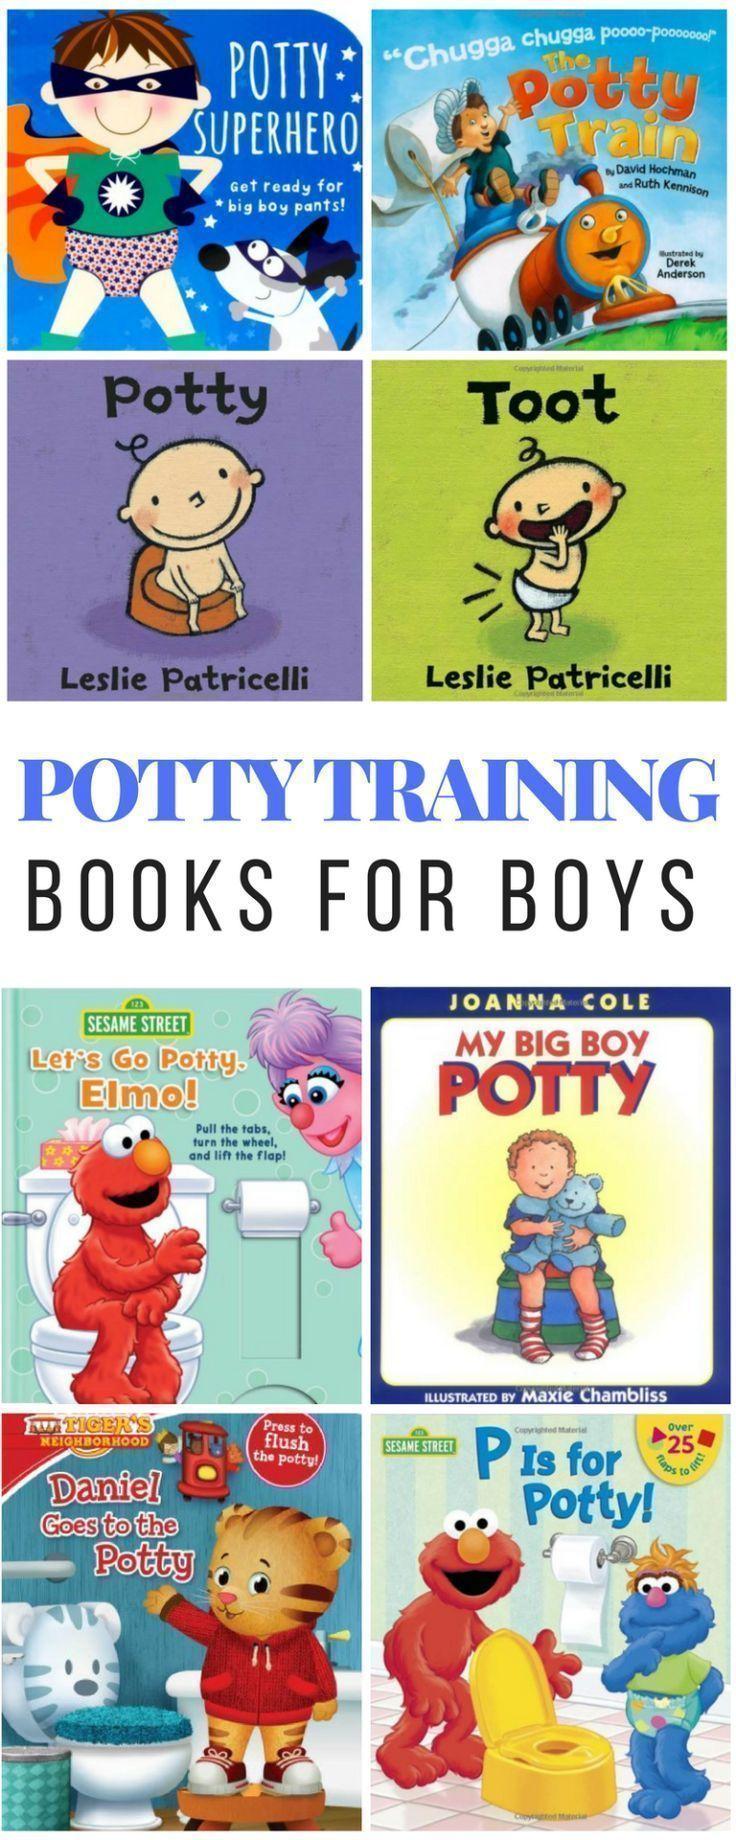 Potty training age potty training , töpfchen